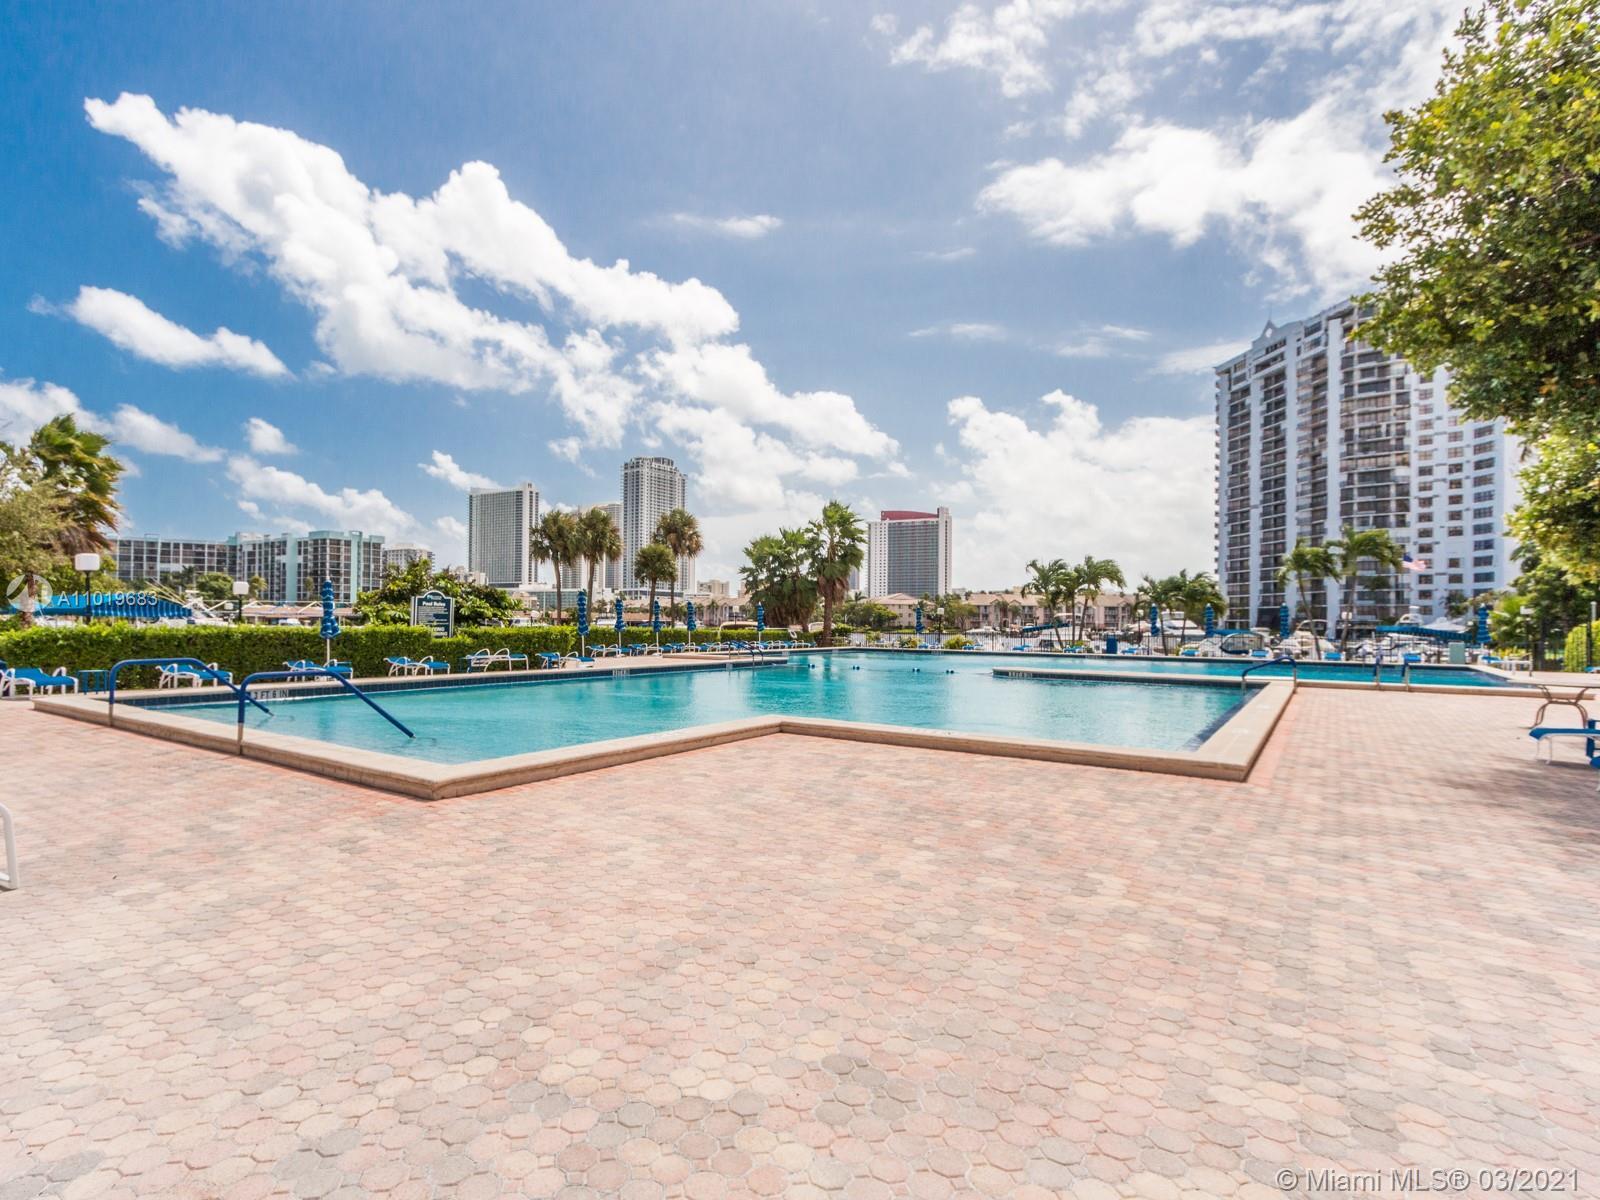 Photo of 2500 PARKVIEW DR. #1406, Hallandale Beach, Florida, 33009 - MARINA POOL